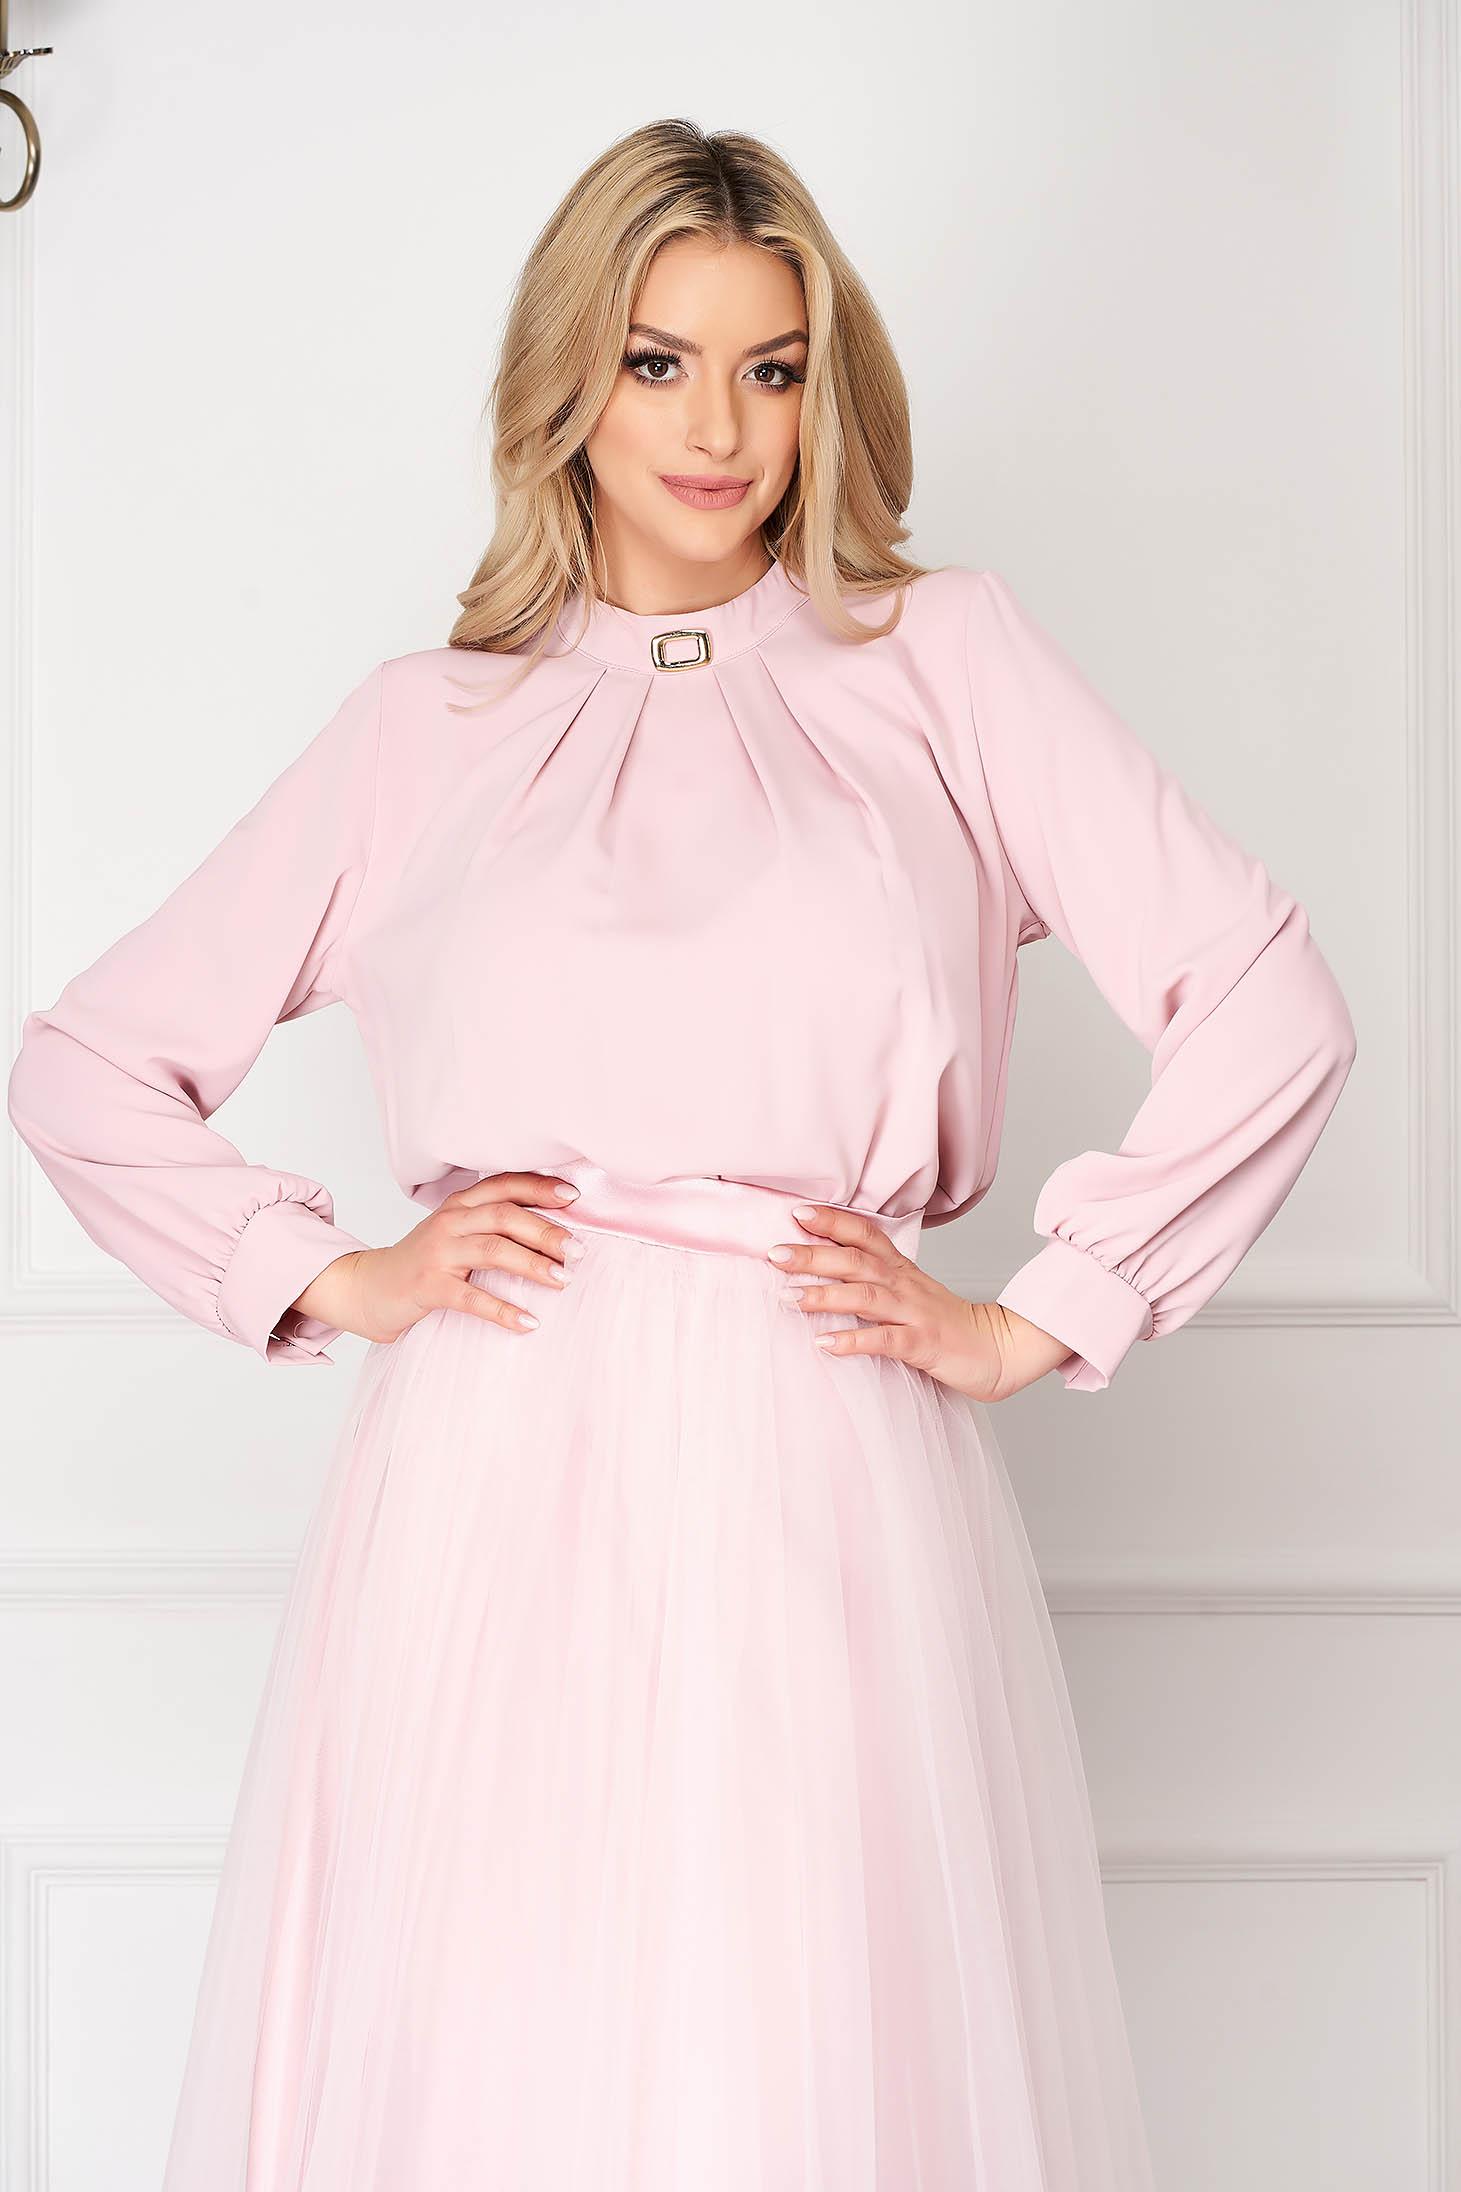 Bluza dama SunShine roz office cu croi larg scurta din voal cu accesoriu metalic